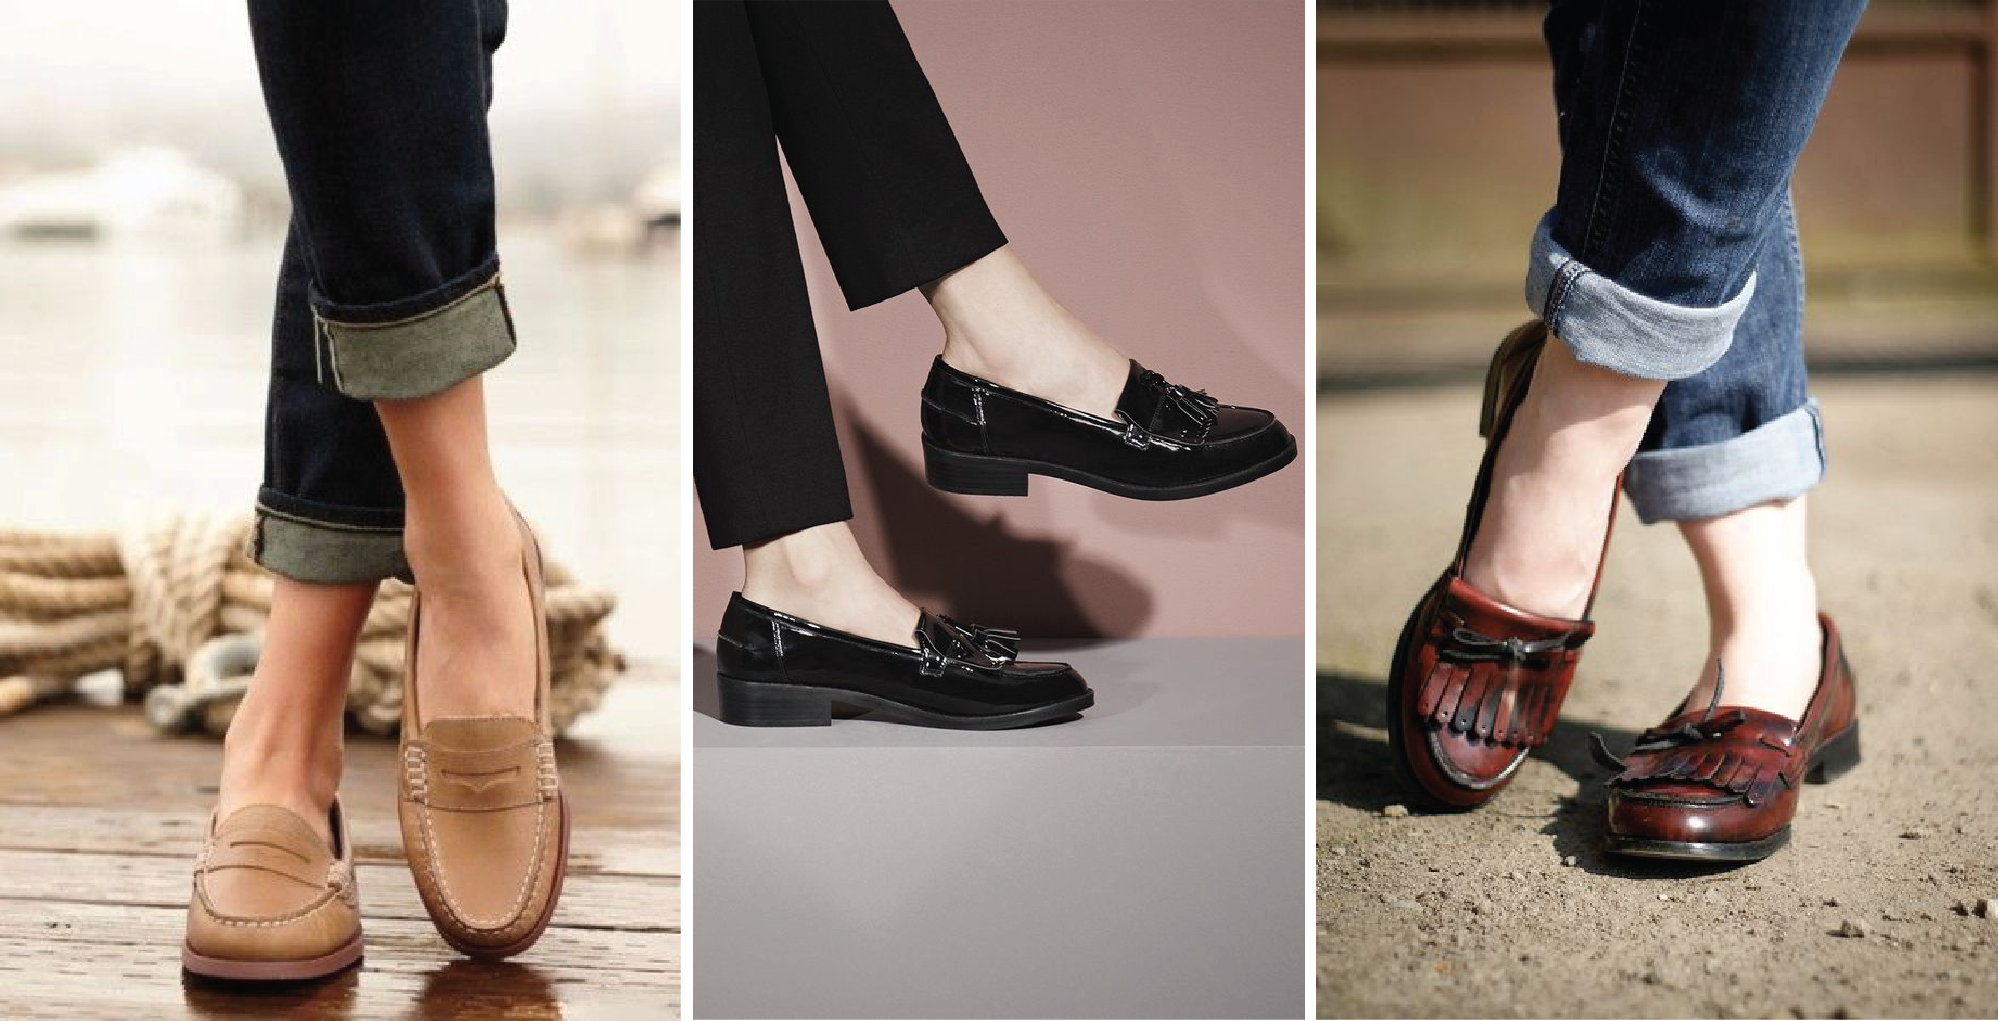 45717669c0 1-sapato-feminino-masculino-mocassin-loafer-slipper-dockside-